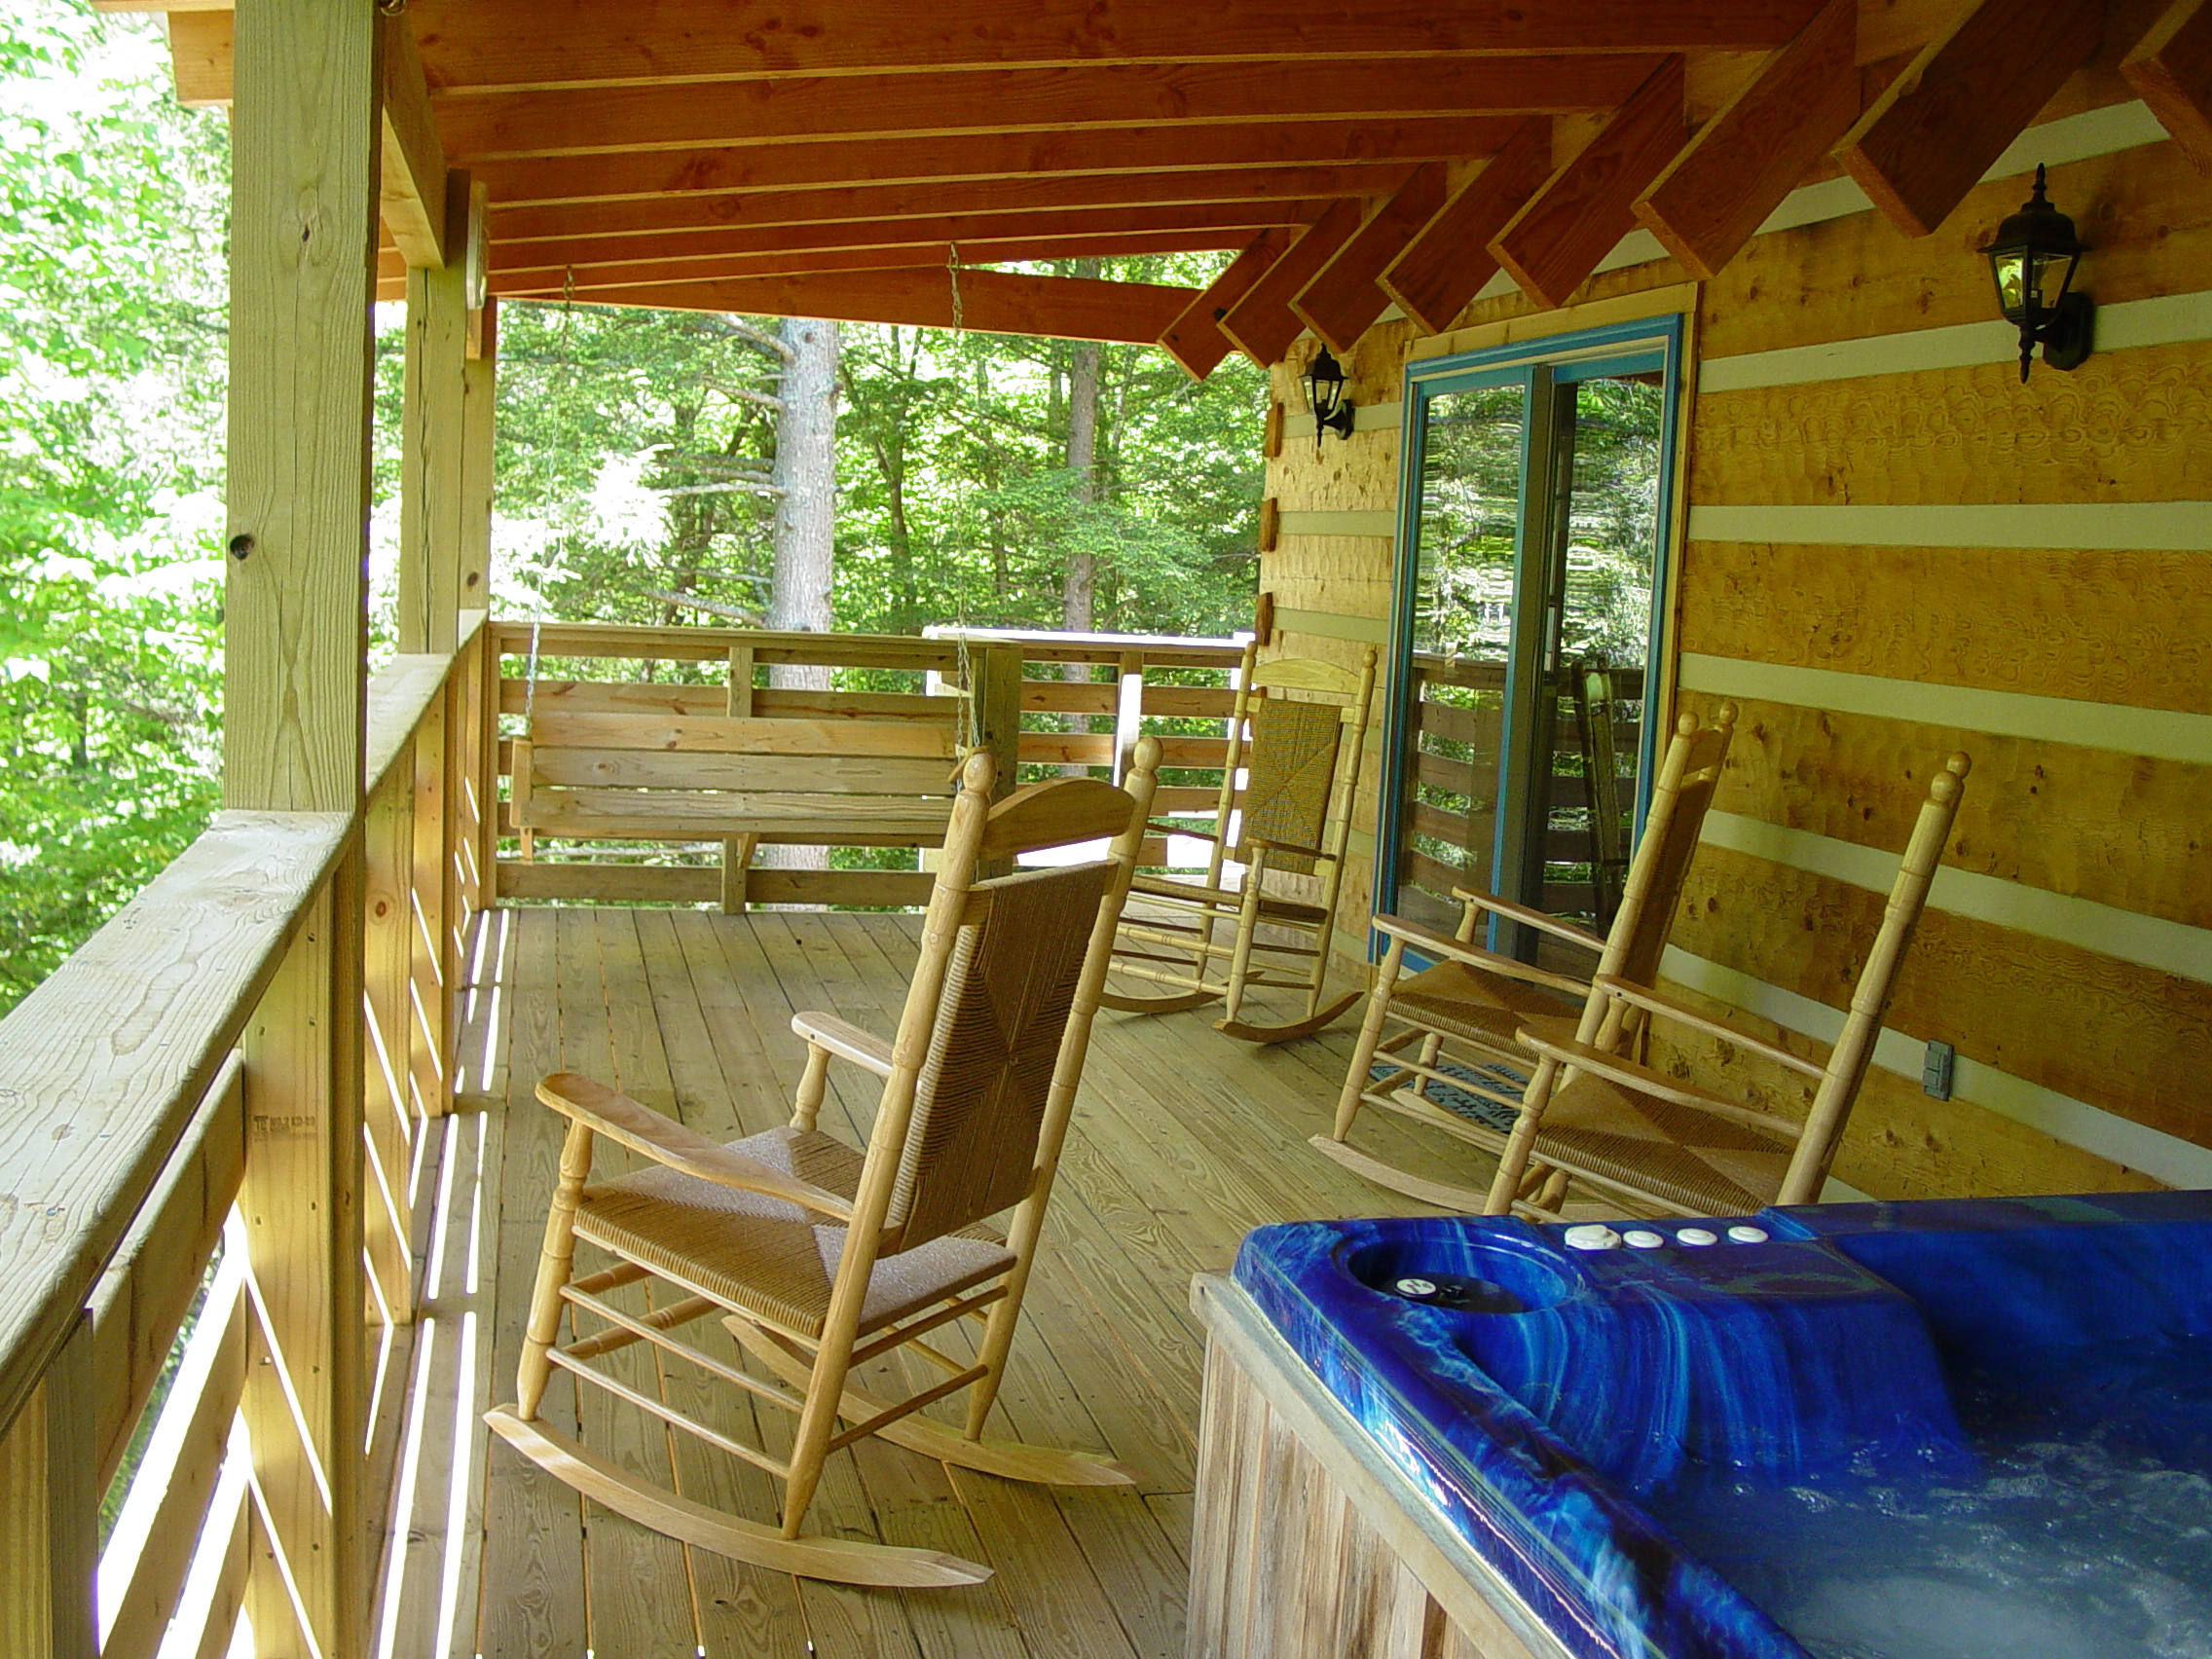 WC - Porch Rocking Chairs Hot Tub 2.jpg